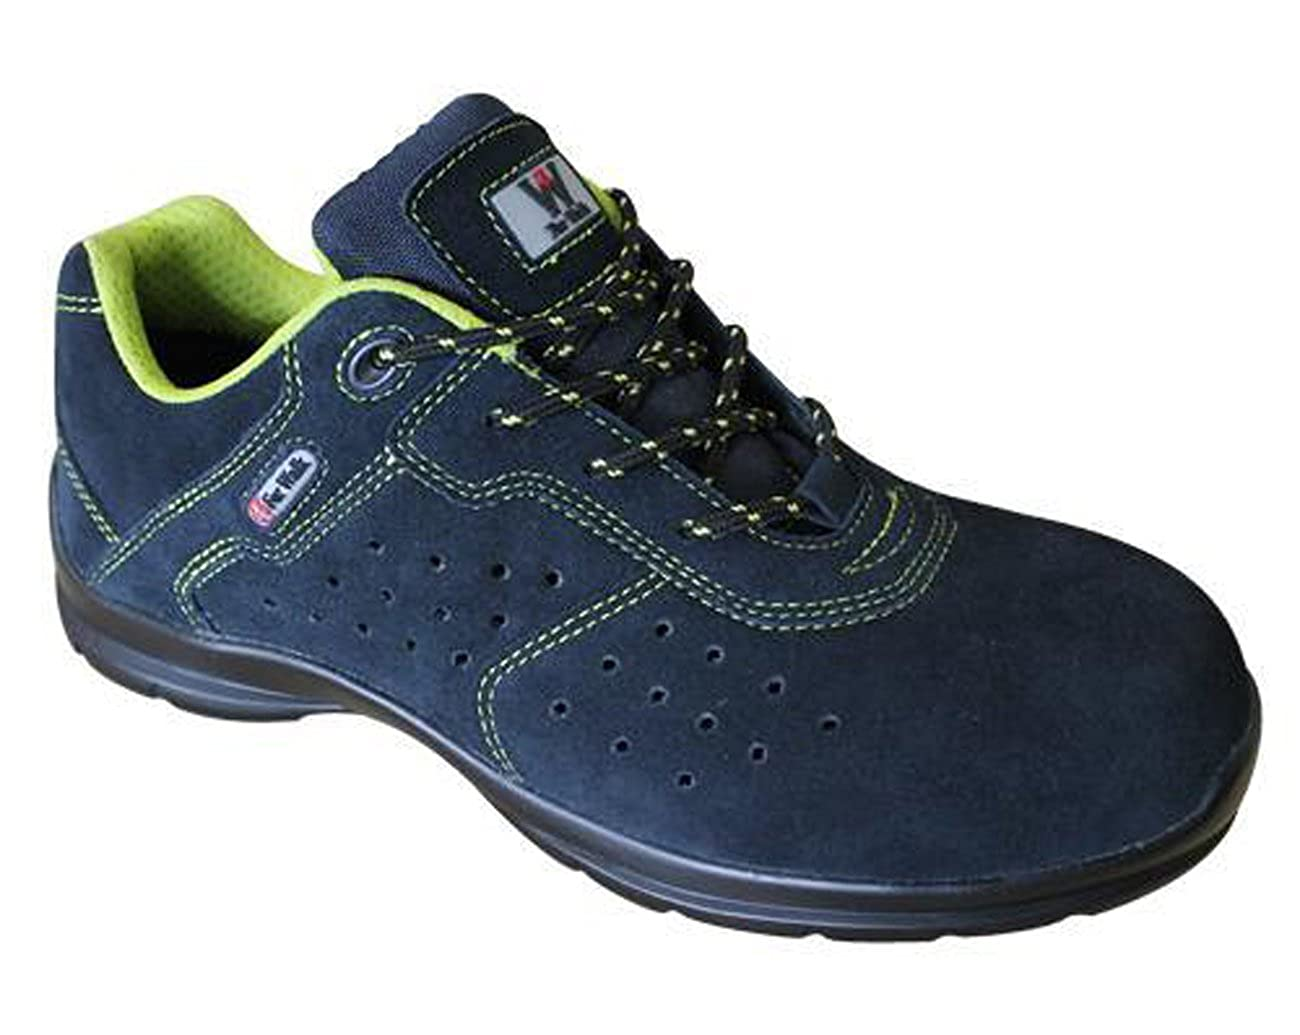 4Walk Nairobi S1+P SRC - zapatos de seguridad ligeros - azul - talla 37 JjRCQ69